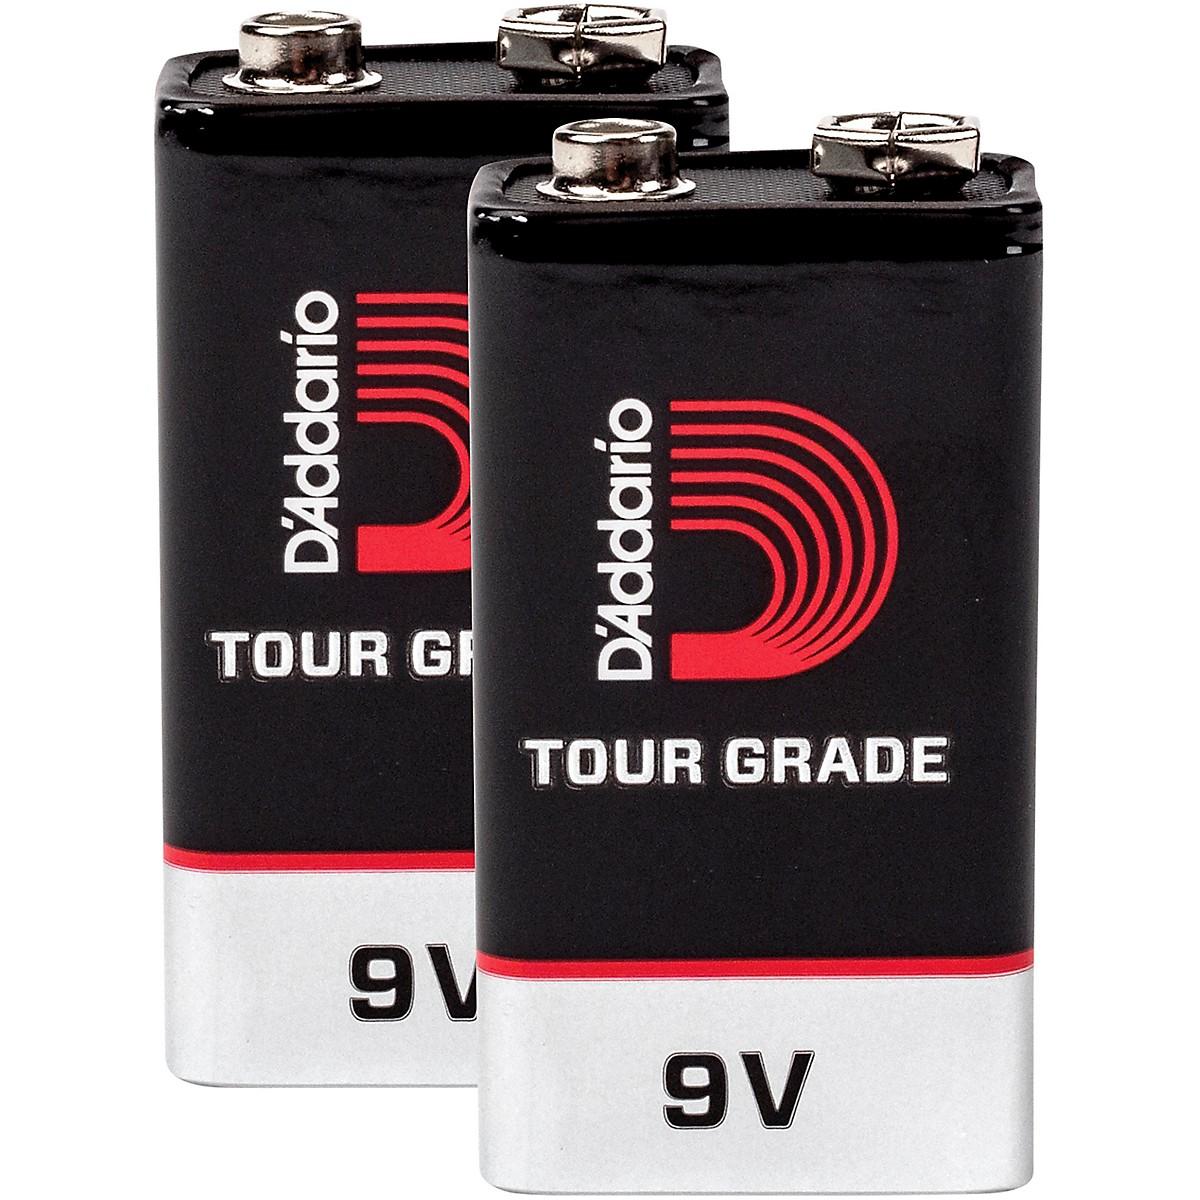 D'Addario Planet Waves 9V Battery 2 Pack